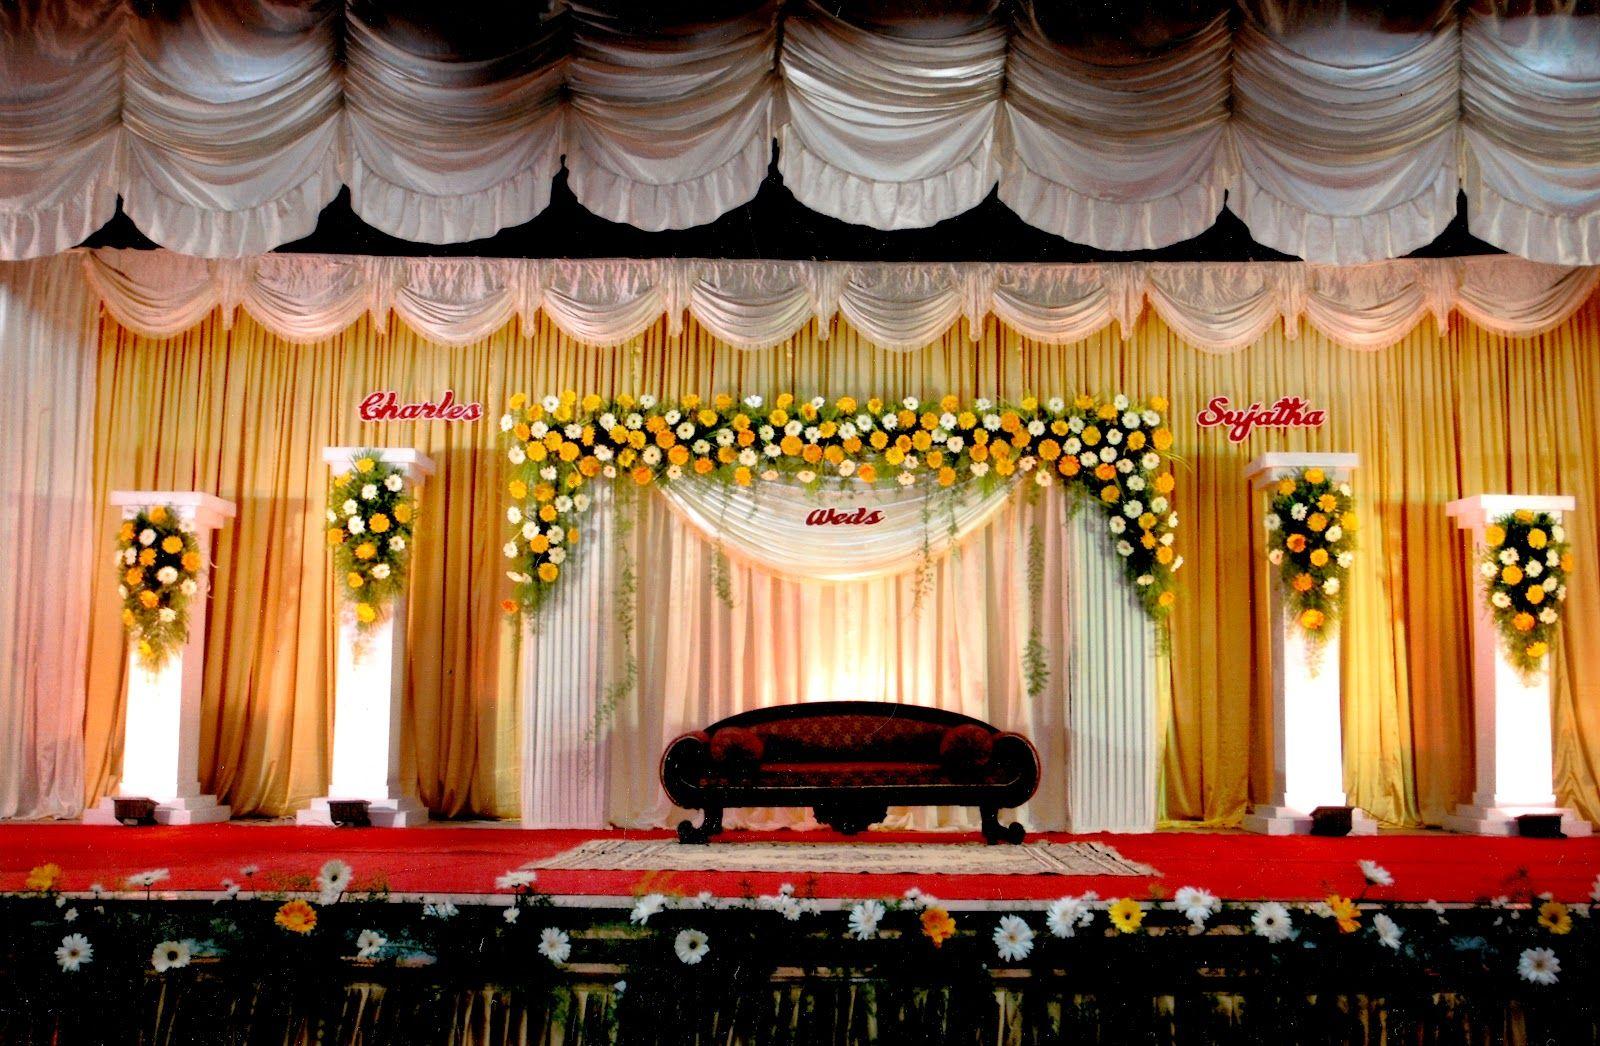 Wedding stage decoration delhi  Praveen Kumar pravinnedunuri on Pinterest